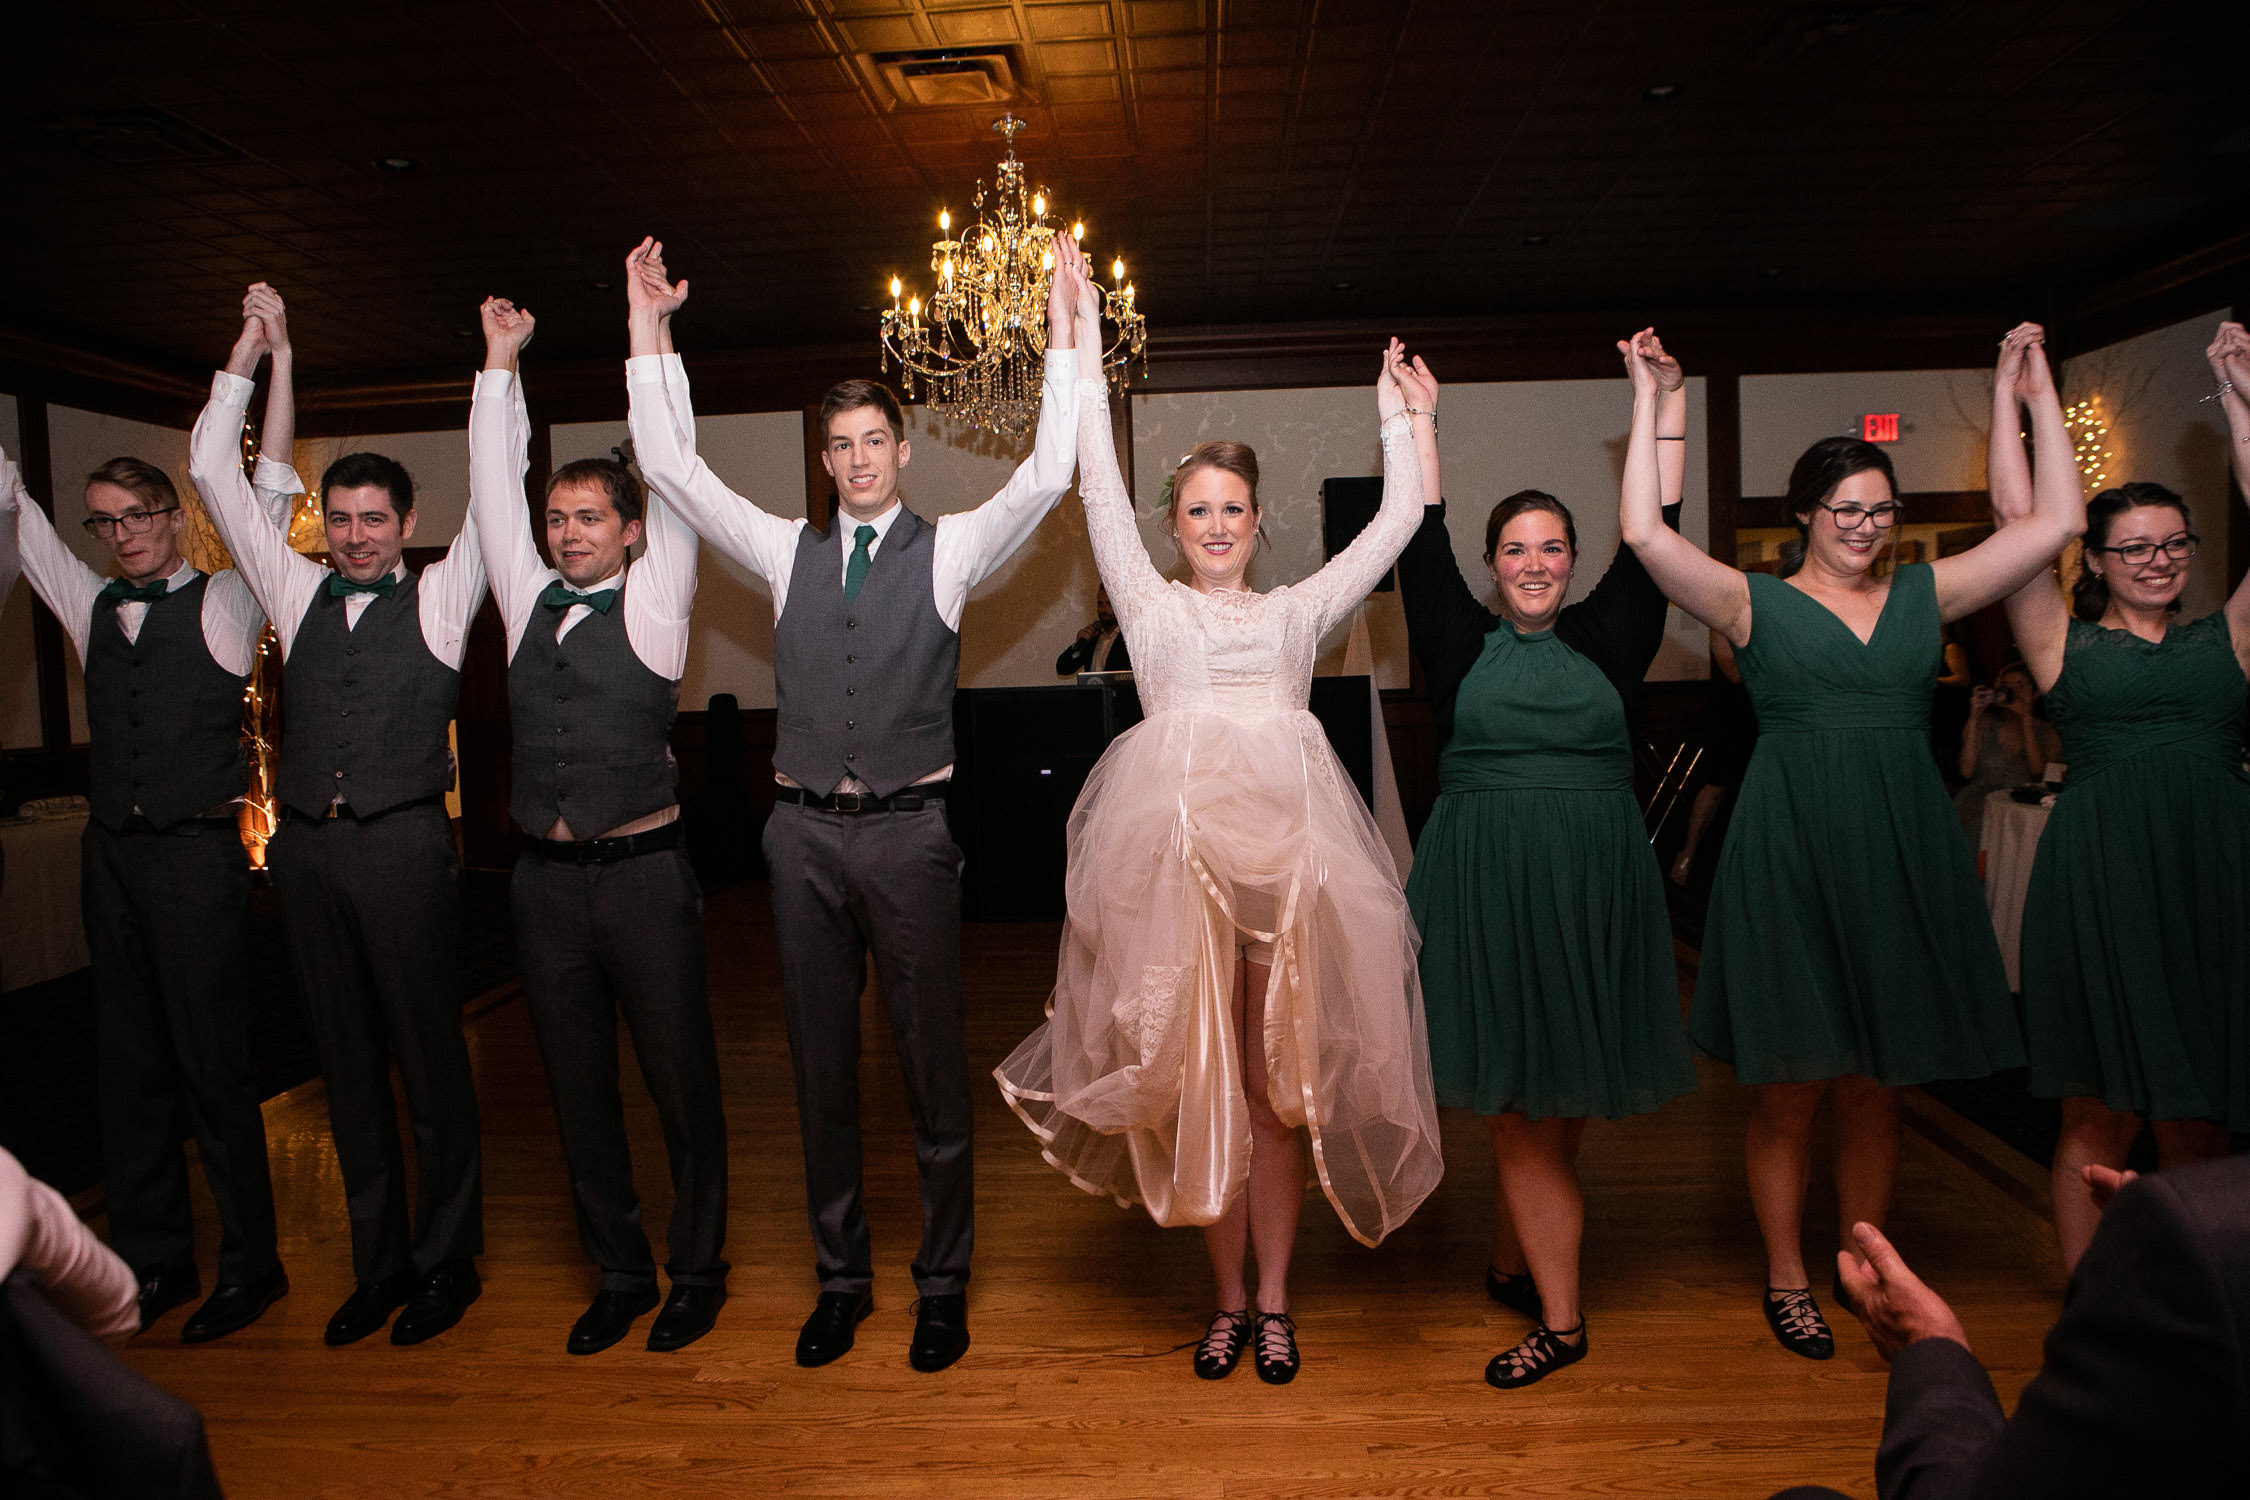 Apple Hill Farm wedding, Irish dance